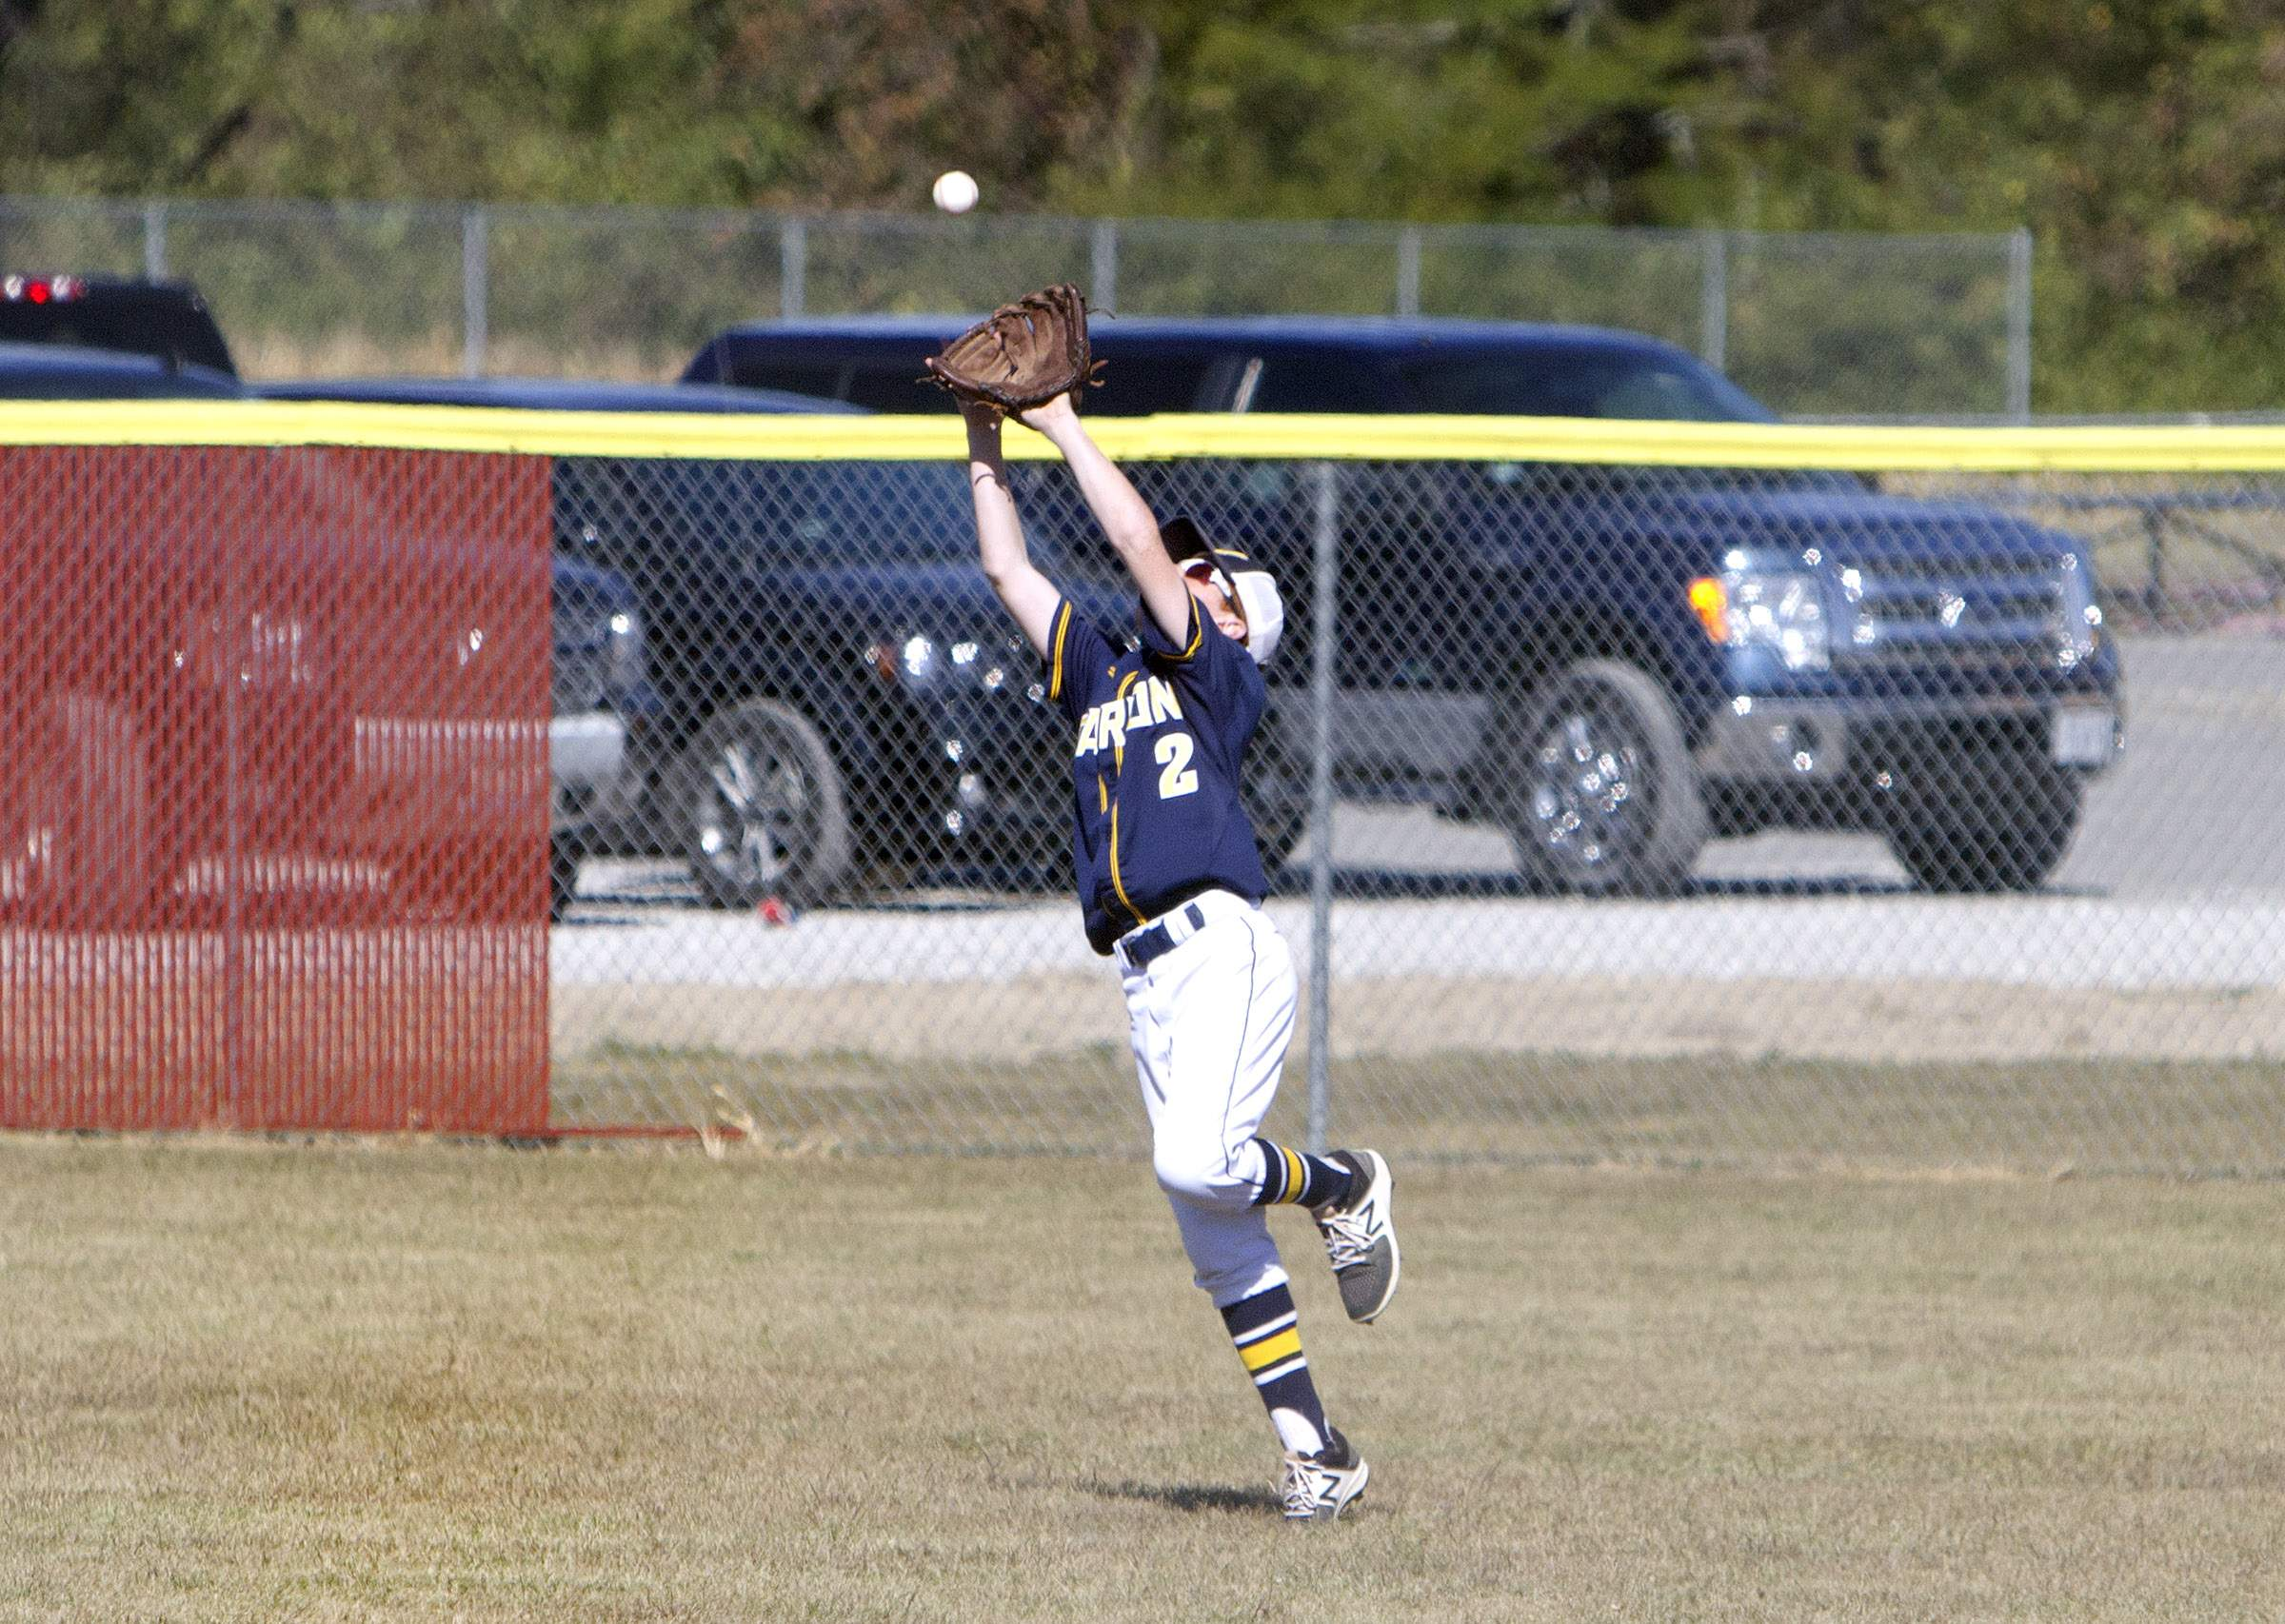 Cole Bundren makes a catch in right field.